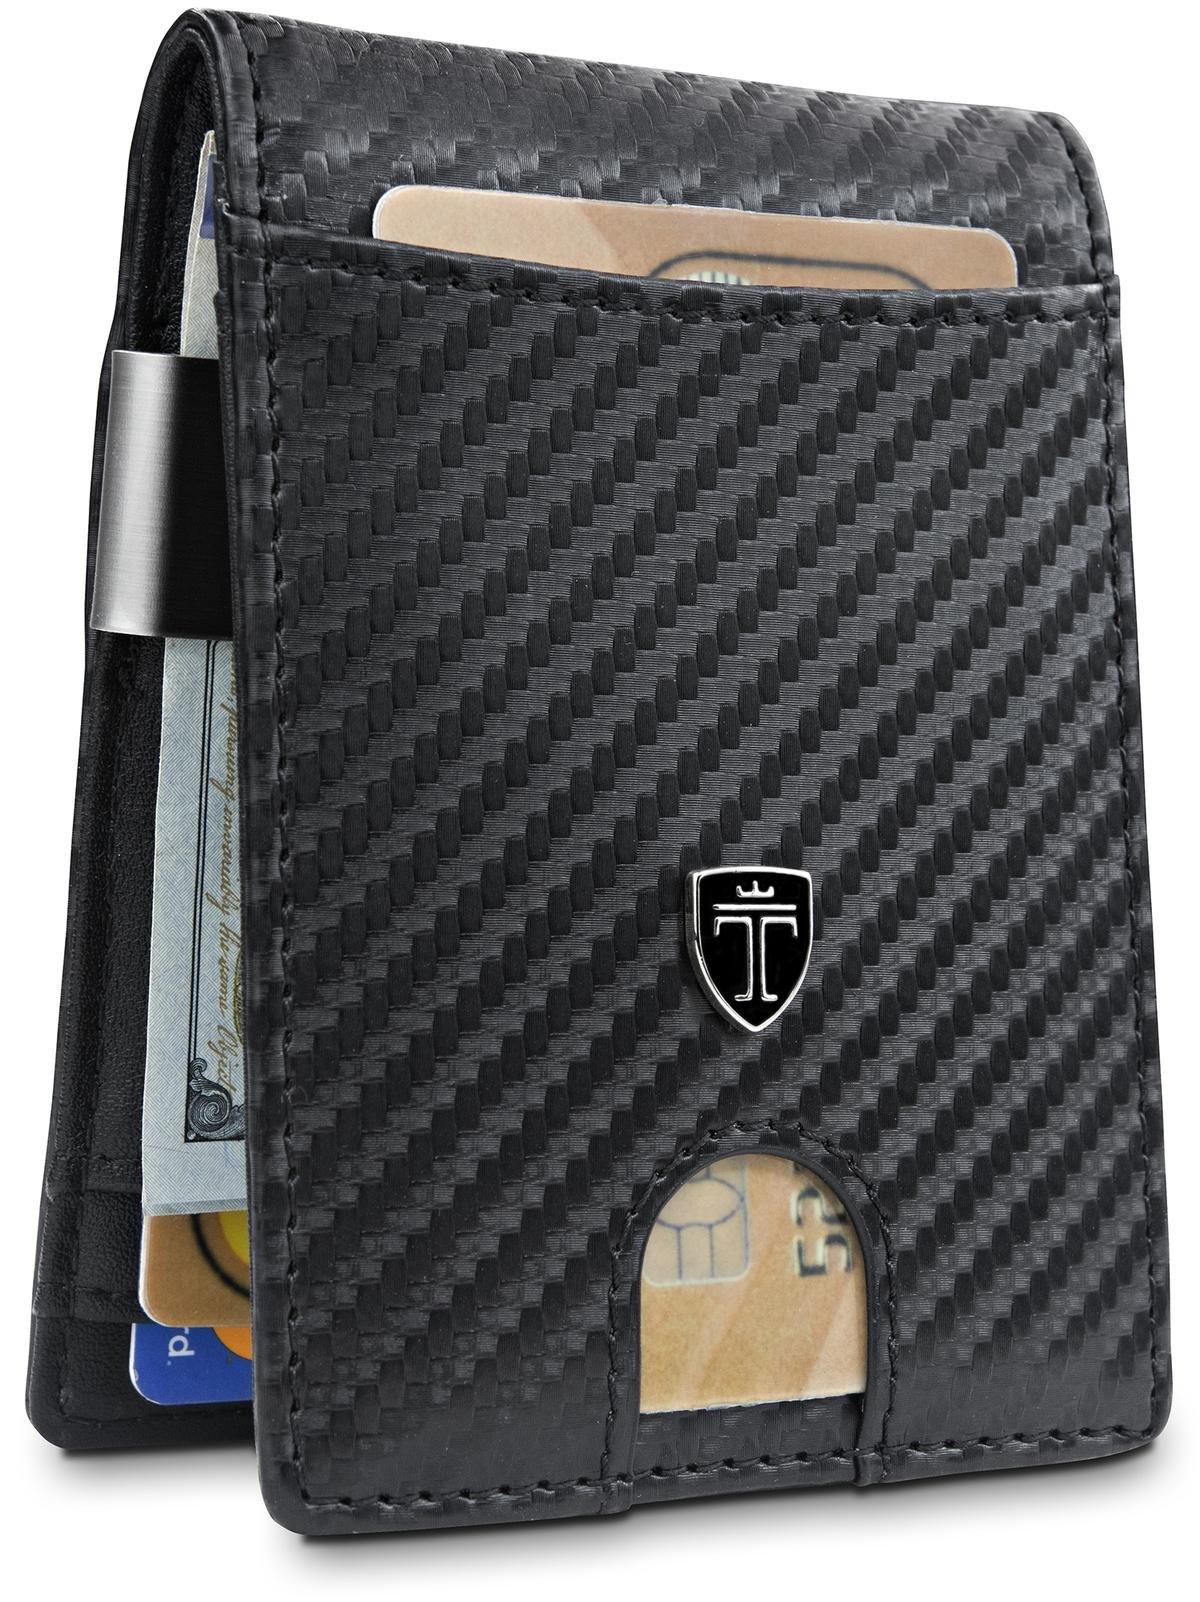 Money Clip Wallet''HOUSTON'' Mens Wallet RFID Blocking Credit Card Holder   Travel Wallet   Minimalist Mini Slim Wallet Bifold for Men with Gift Box TRAVANDO